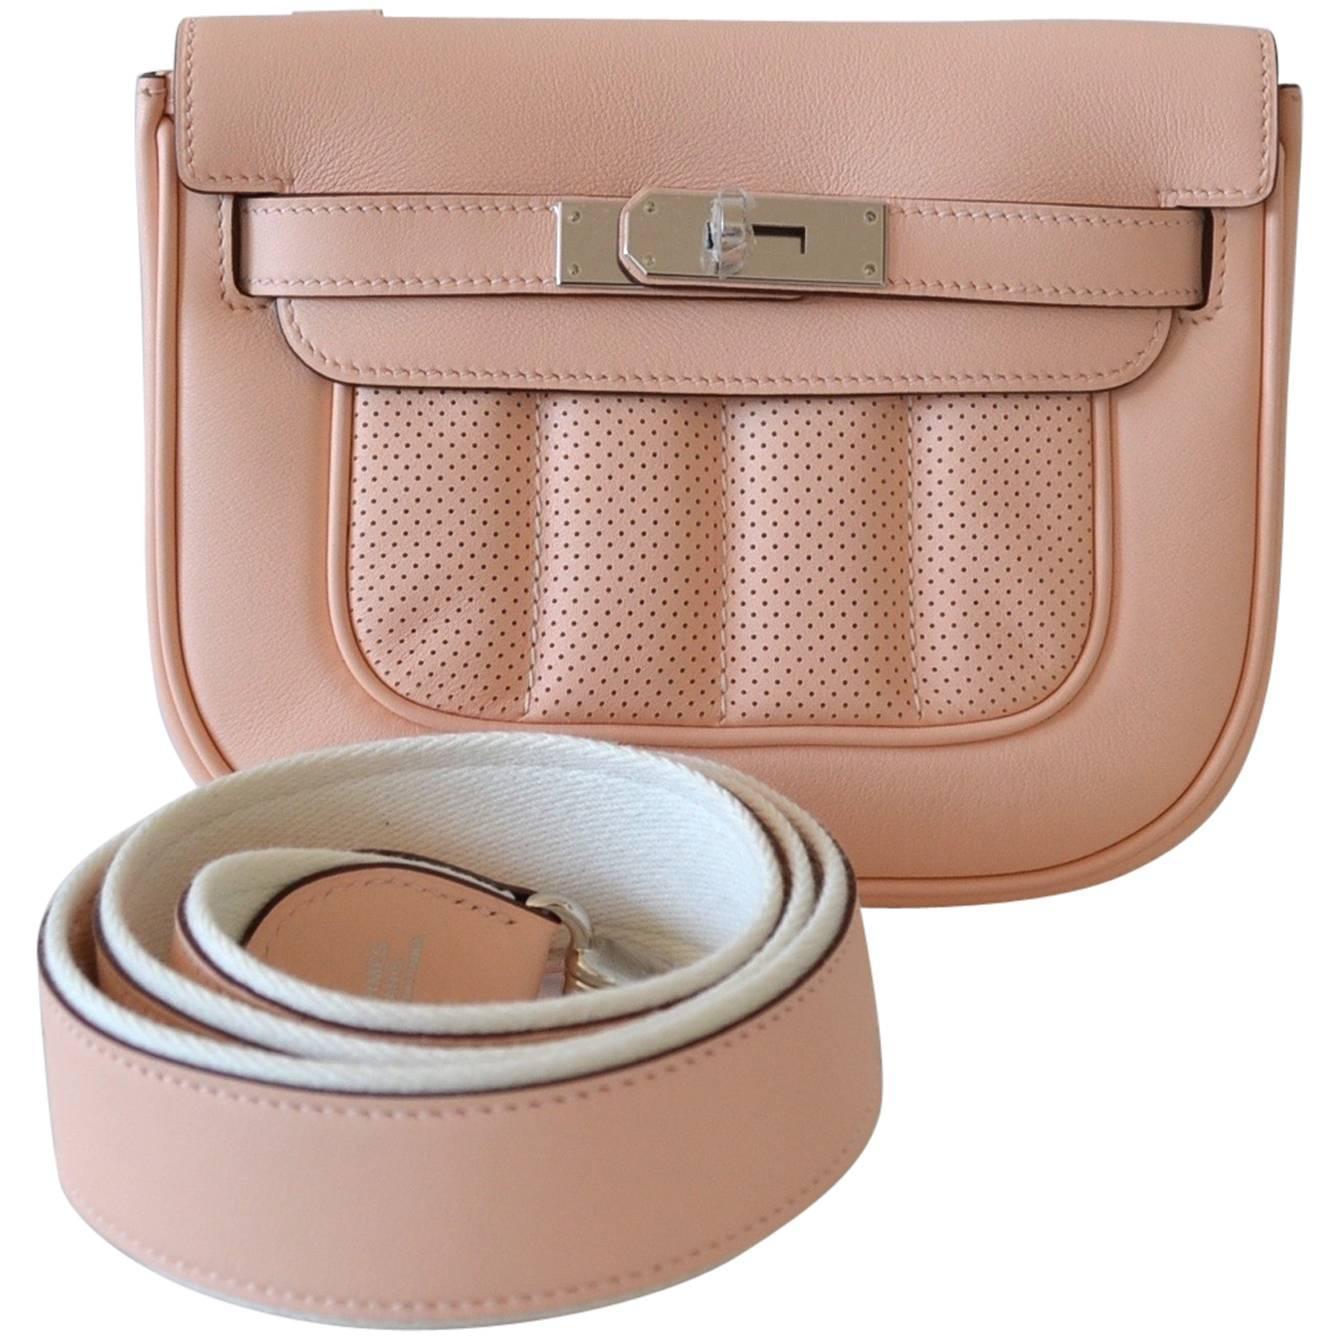 Hermes handbag Mini Berline Swift Rose Sakura at 1stdibs